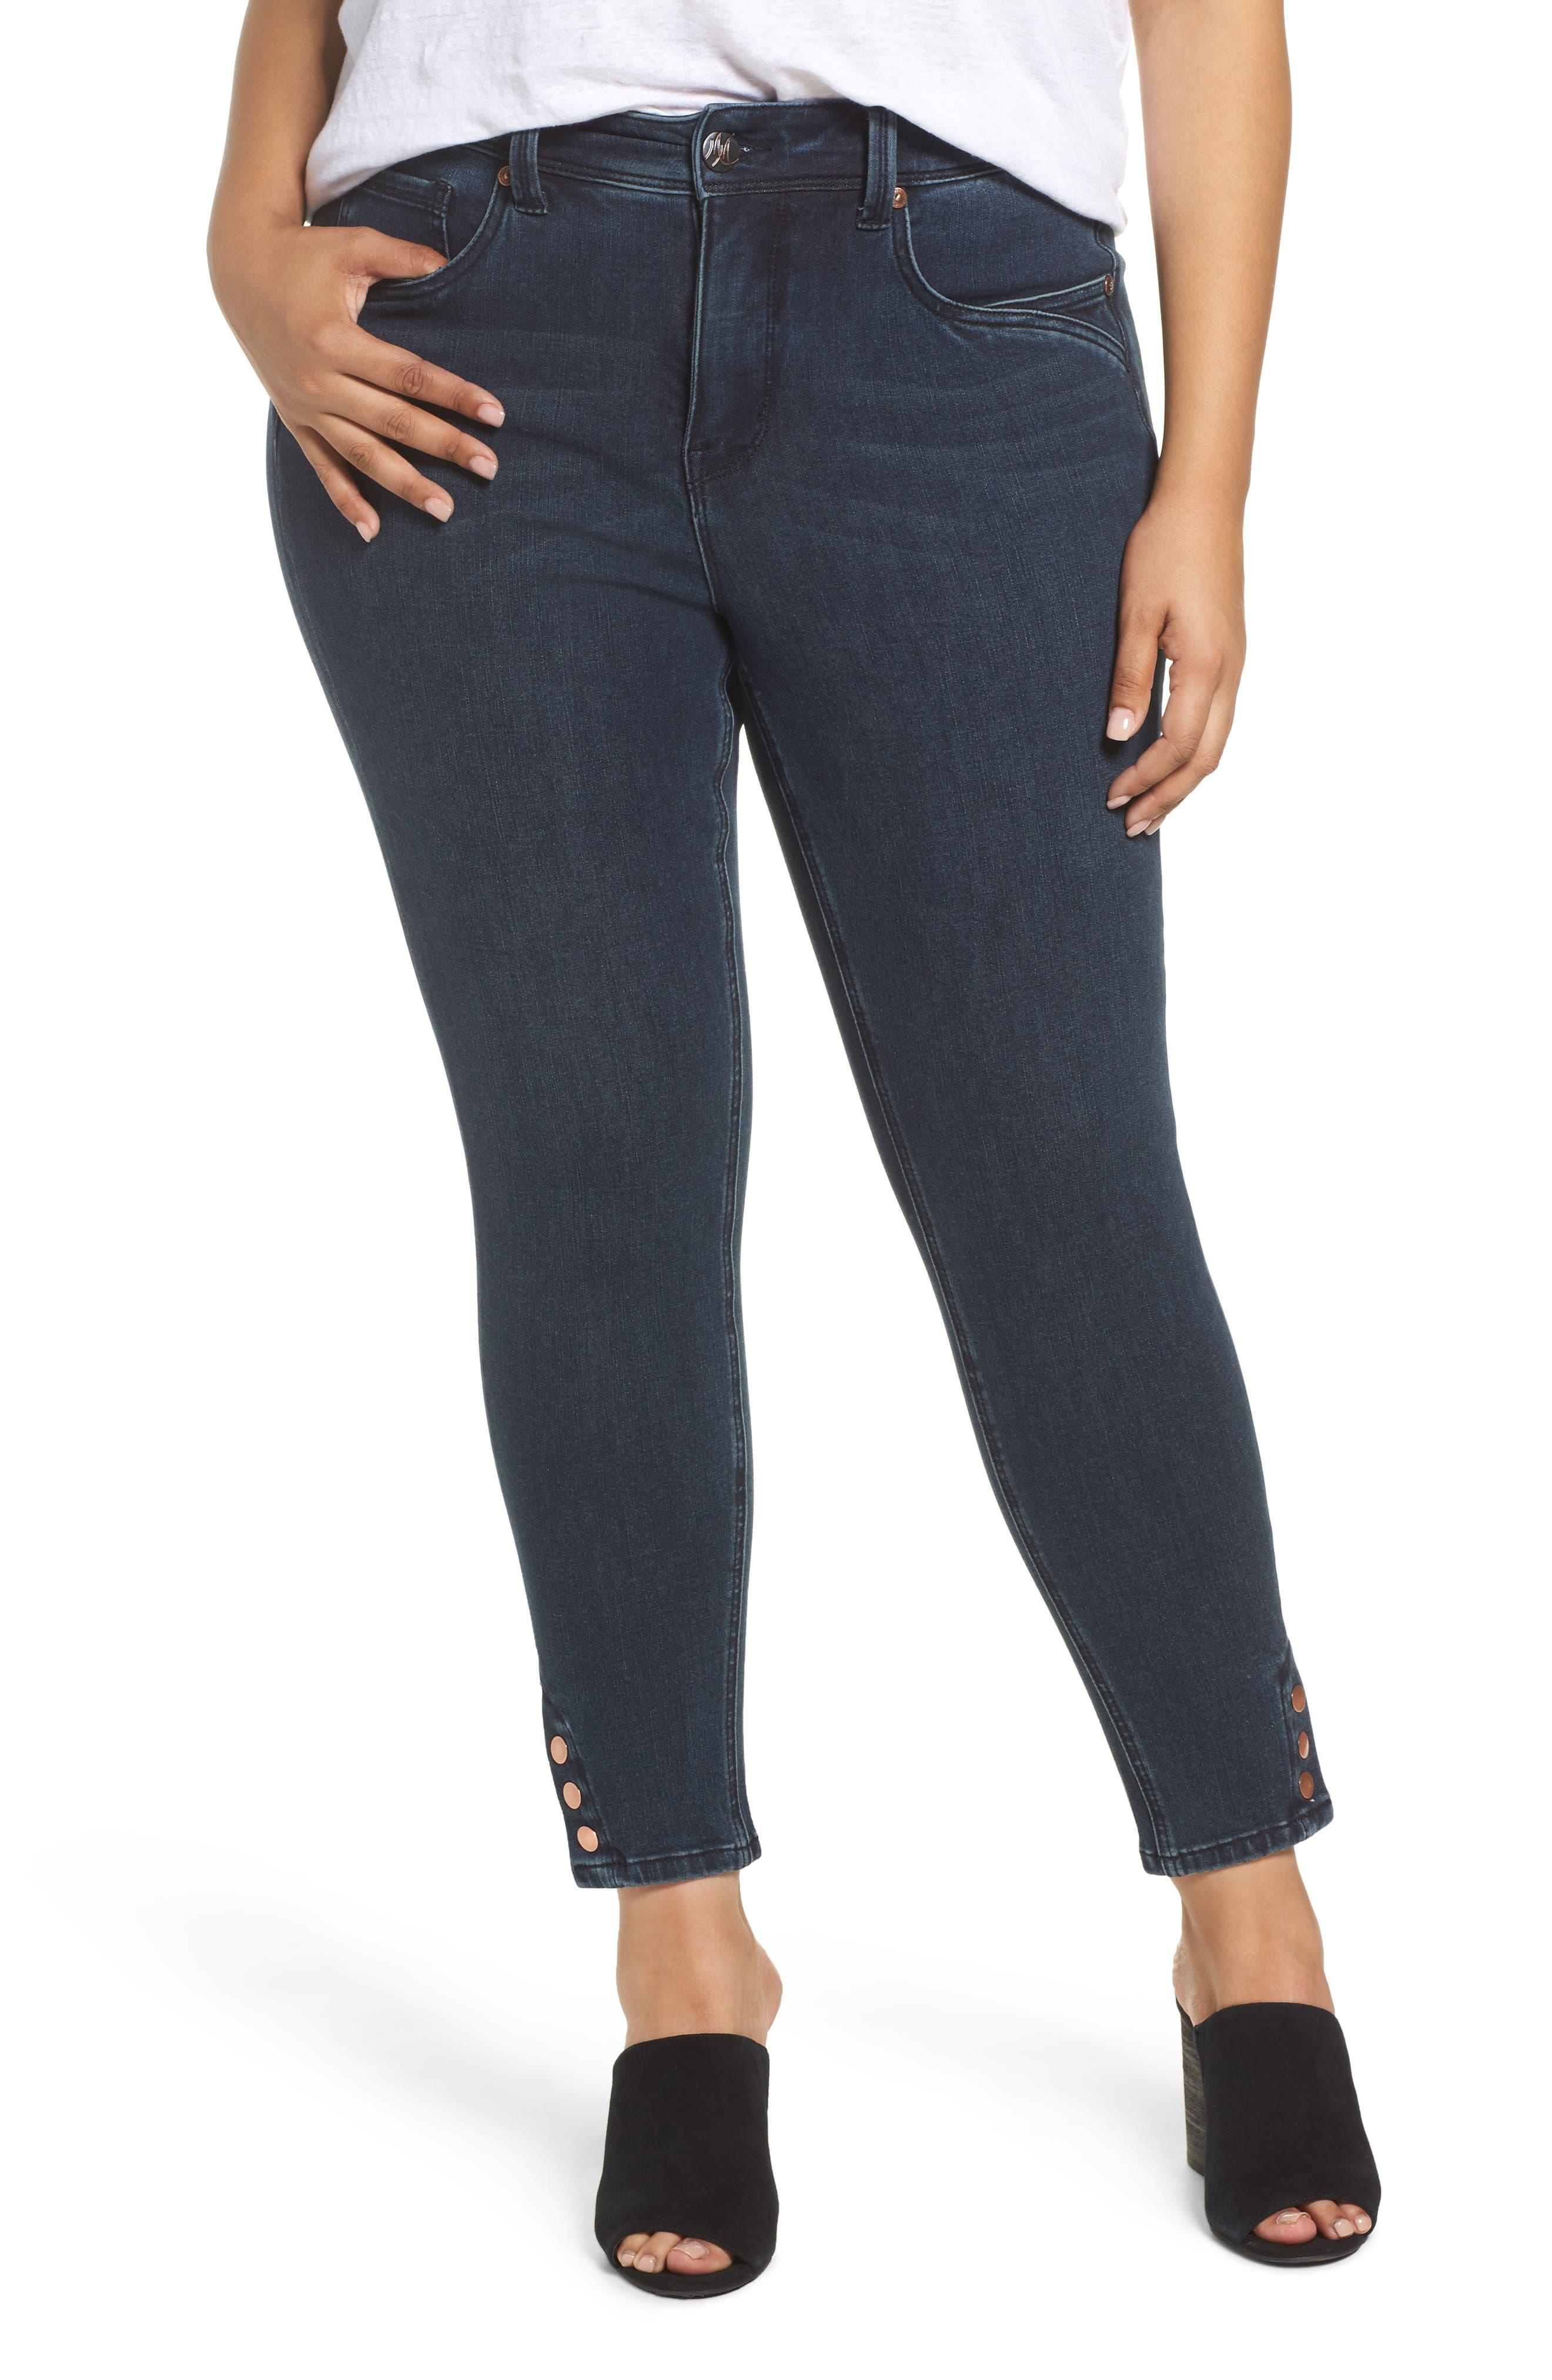 Main Image - Melissa McCarthy Seven7 Snap Hem Pencil Jeans (Sasha) (Plus Size)